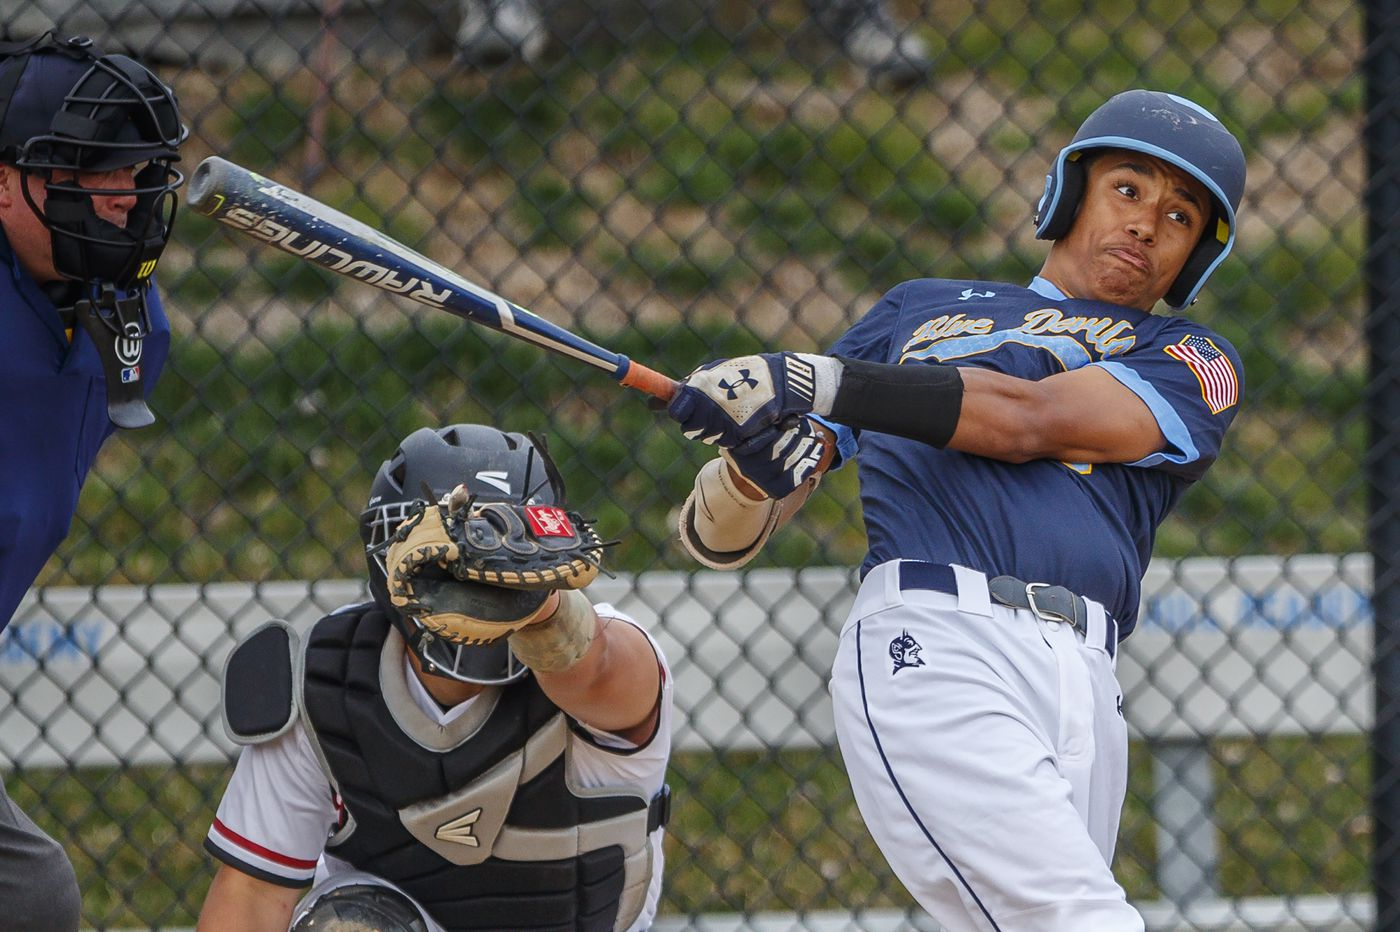 Tuesday's Southeastern Pa. roundup: Haverford School baseball knocks off Malvern Prep in nine innings